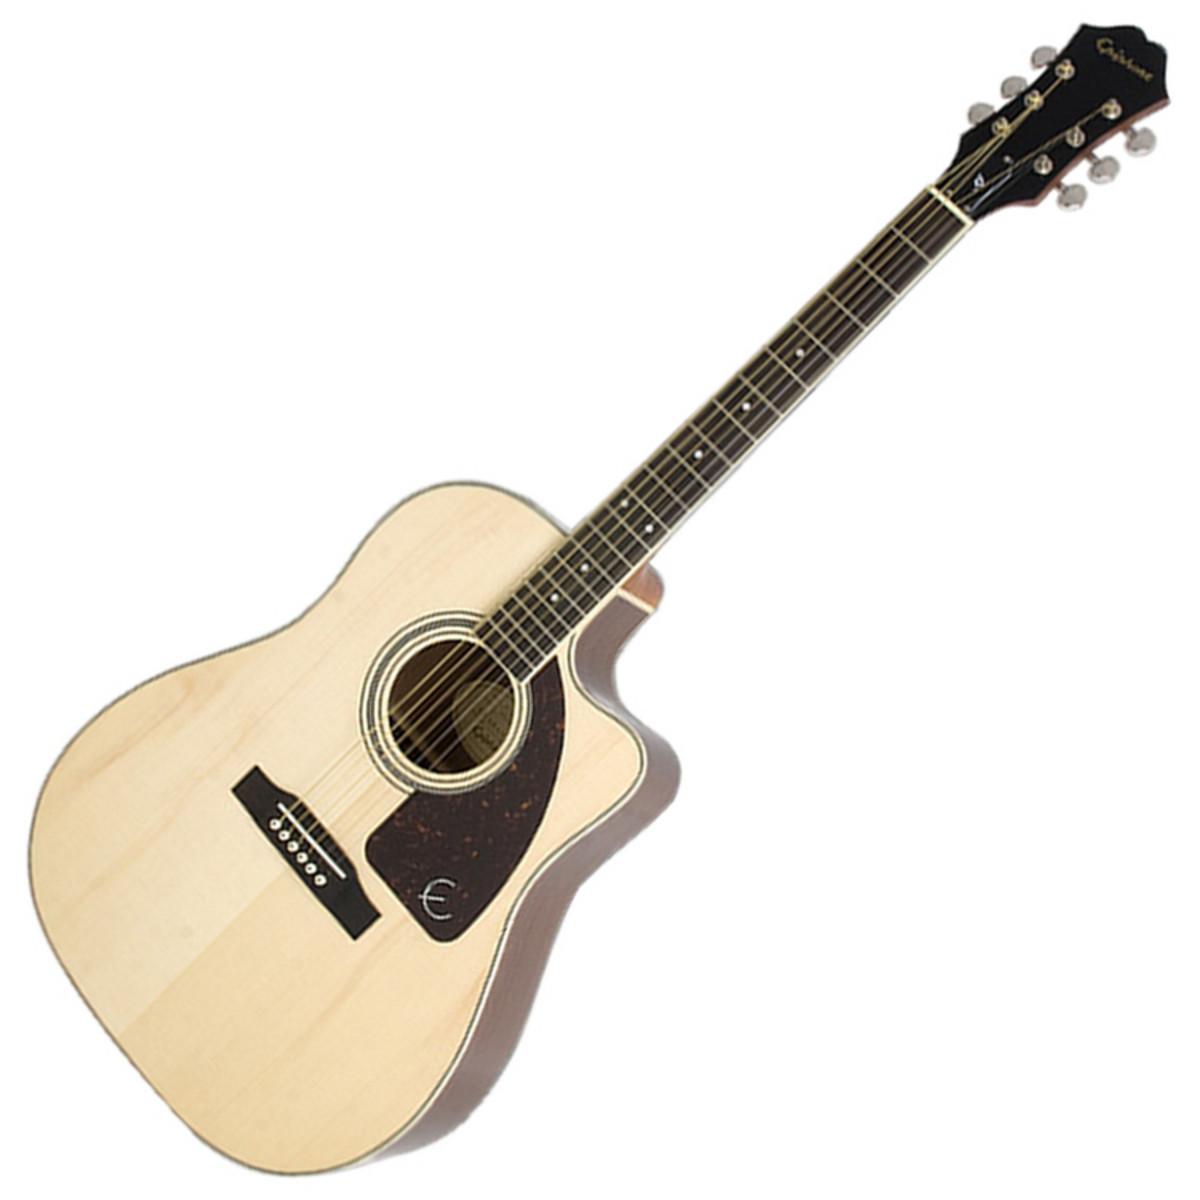 epiphone aj 220sce guitare electro acoustique d 39 occasion. Black Bedroom Furniture Sets. Home Design Ideas